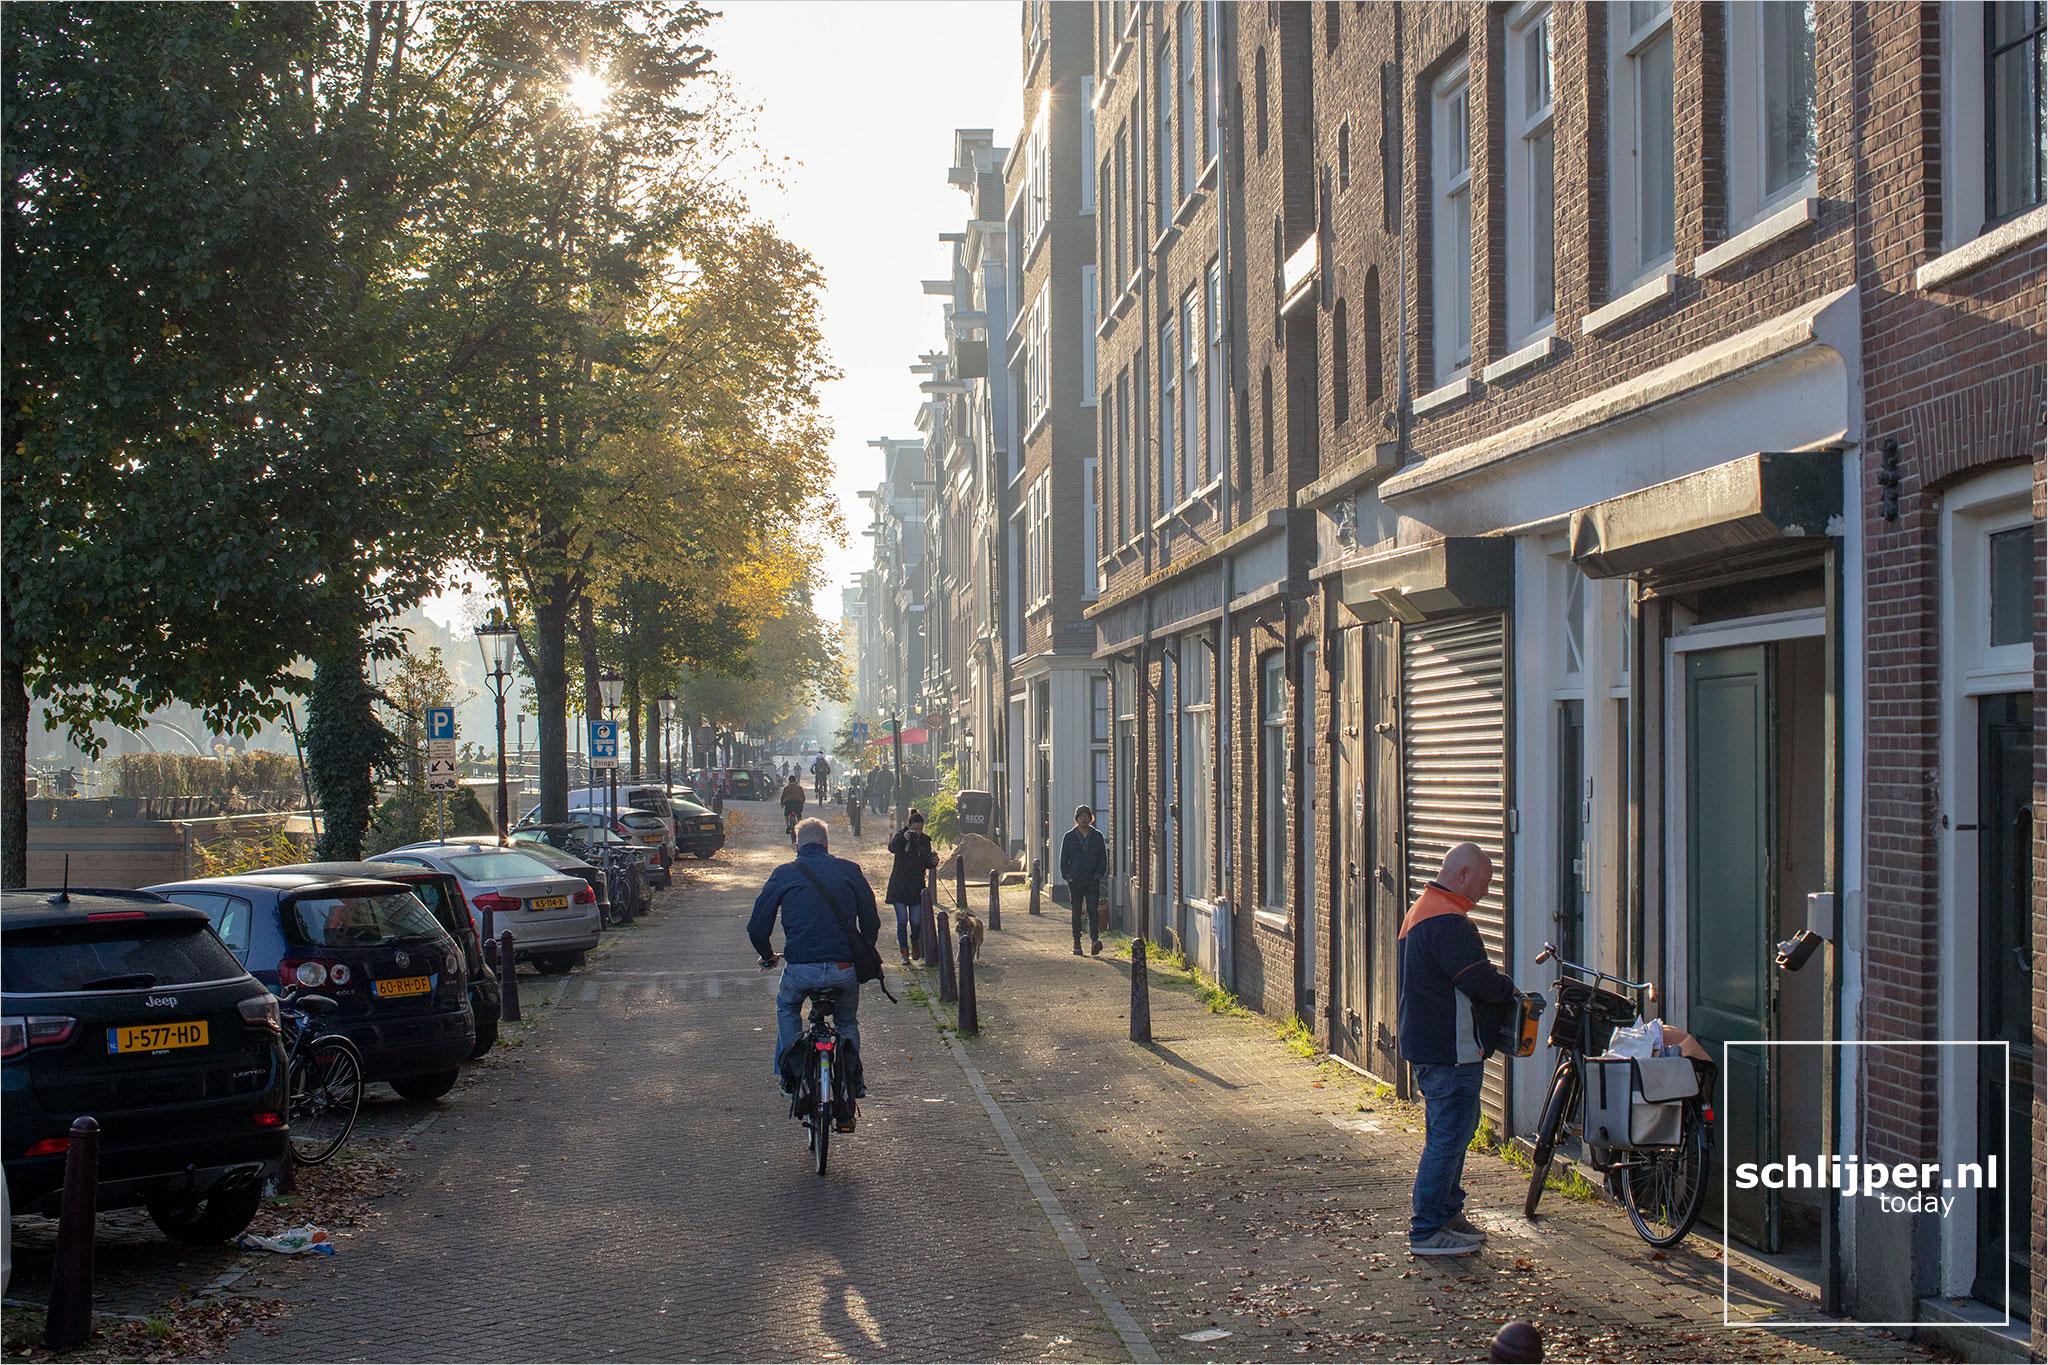 Nederland, Amsterdam, 23 oktober 2020